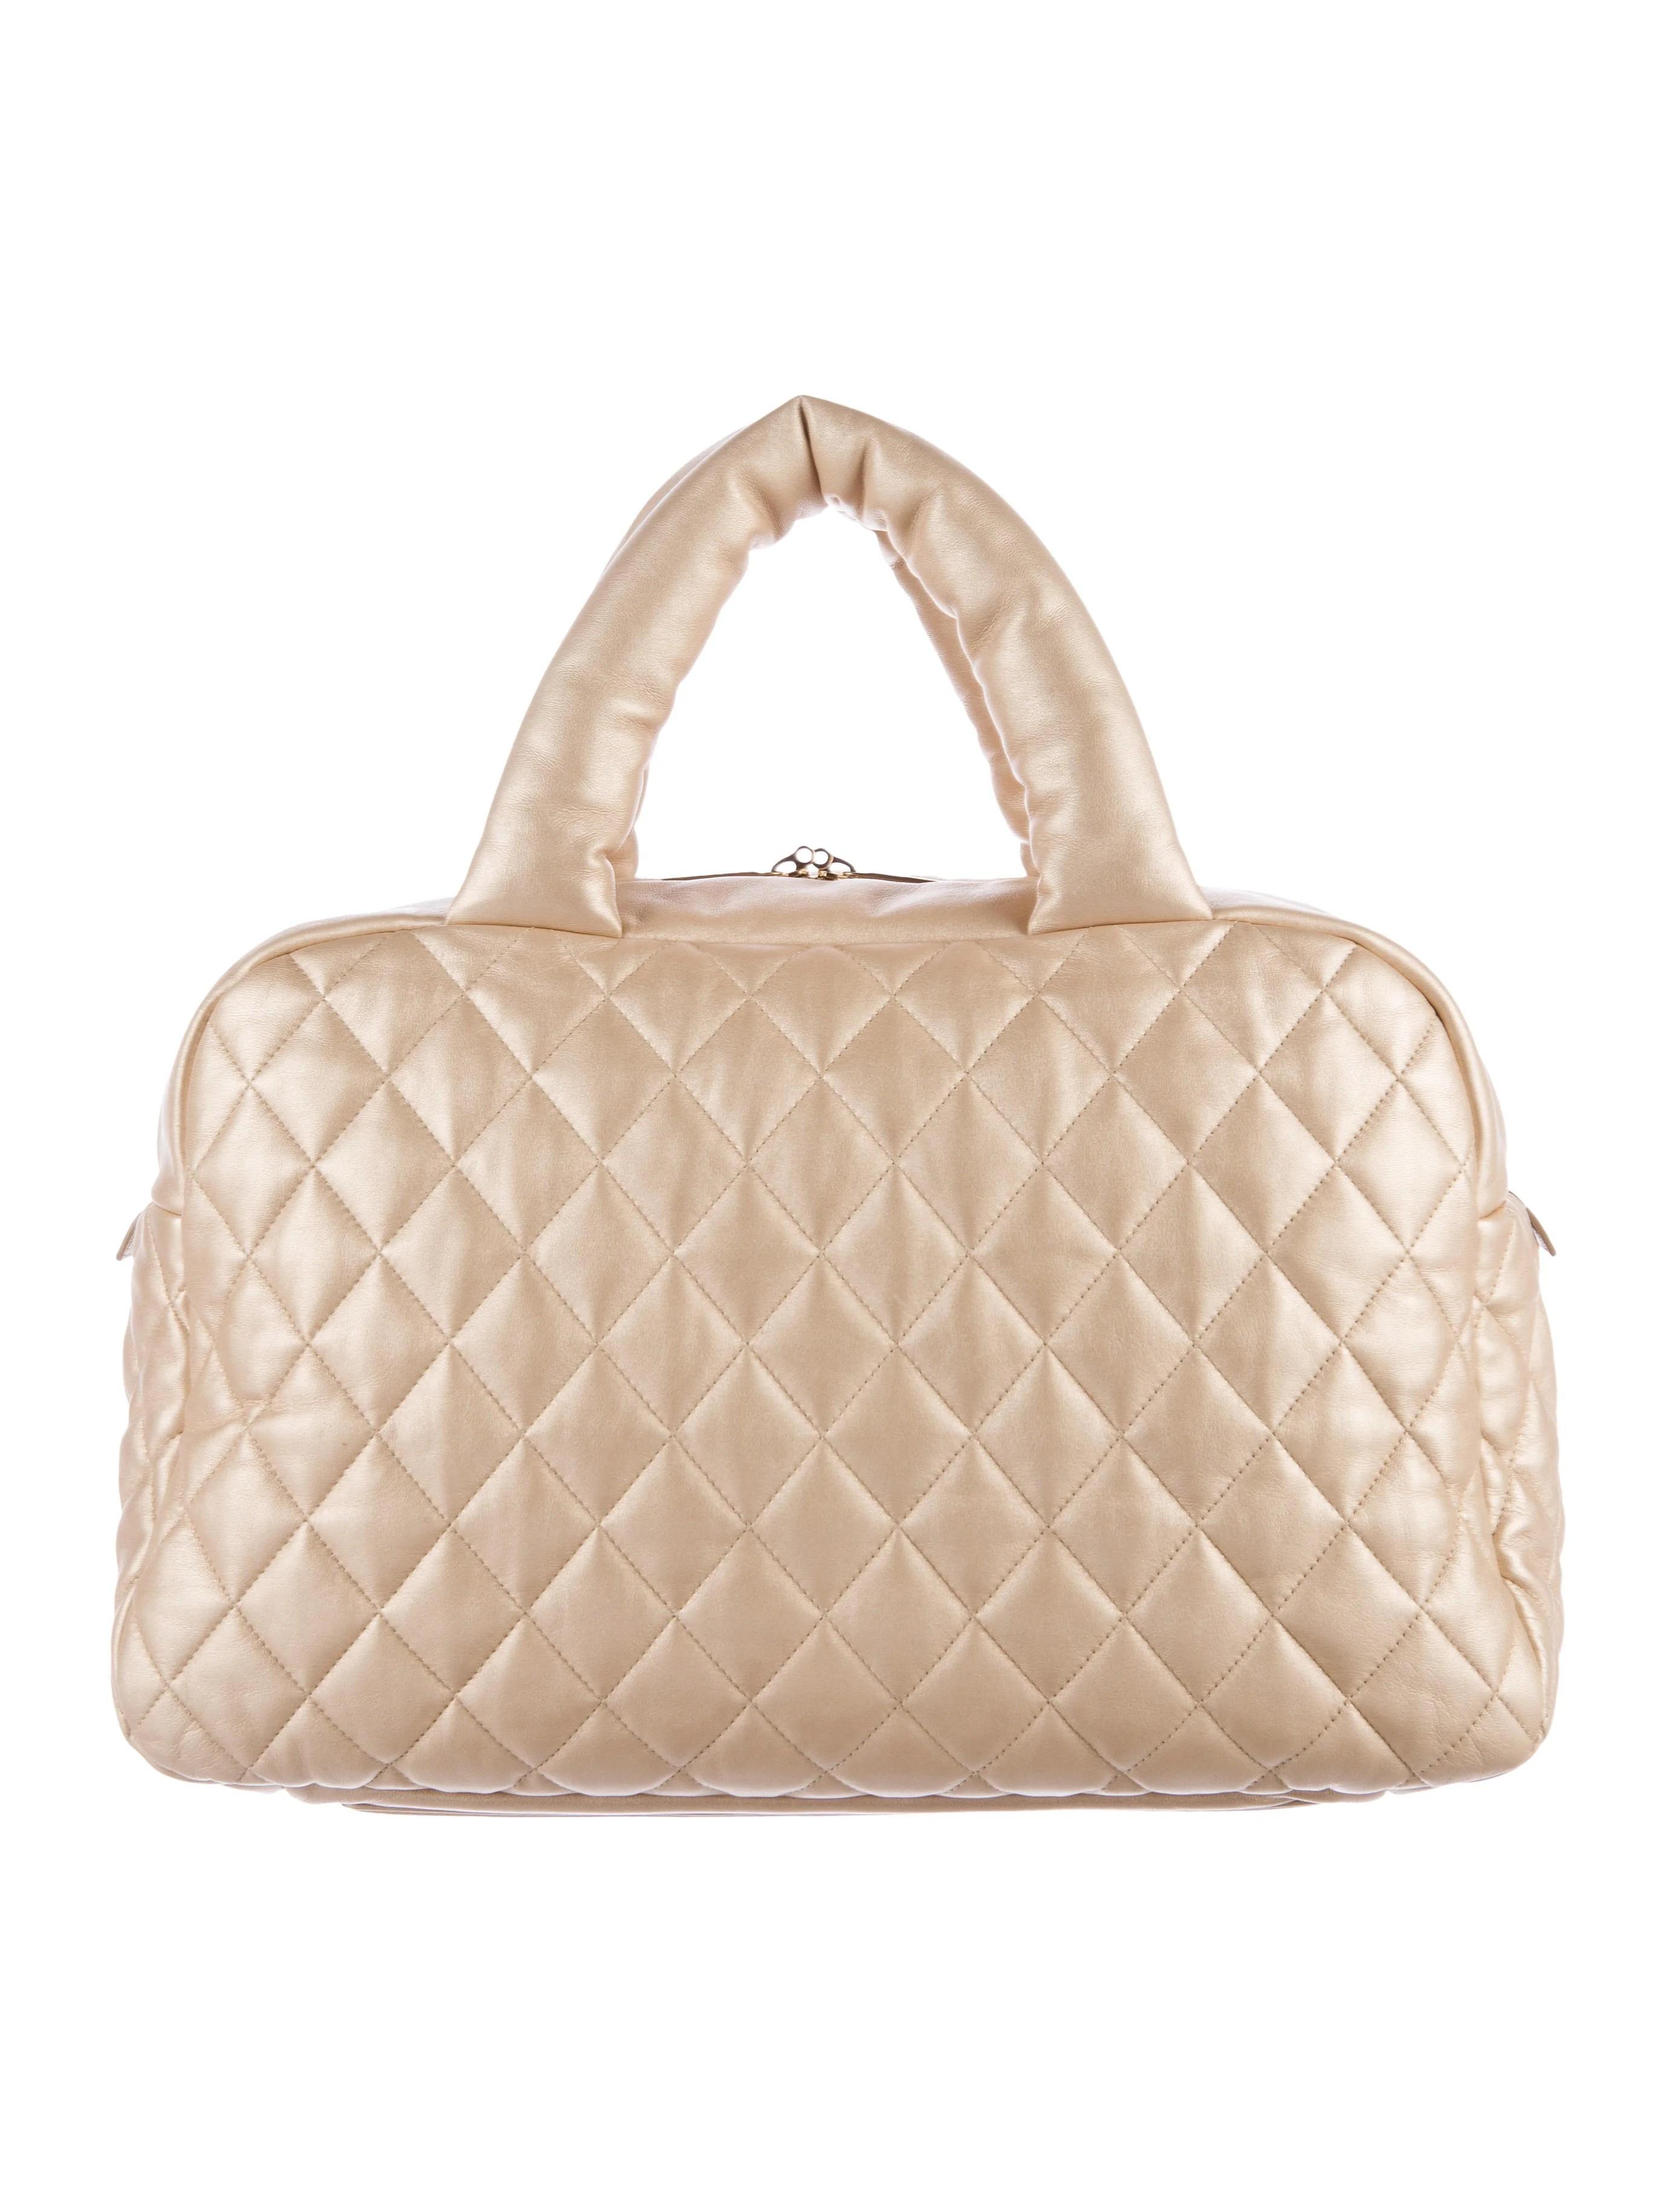 Chanel Coco Cocoon Bowler Bag - Handbags - CHA161600   The ...